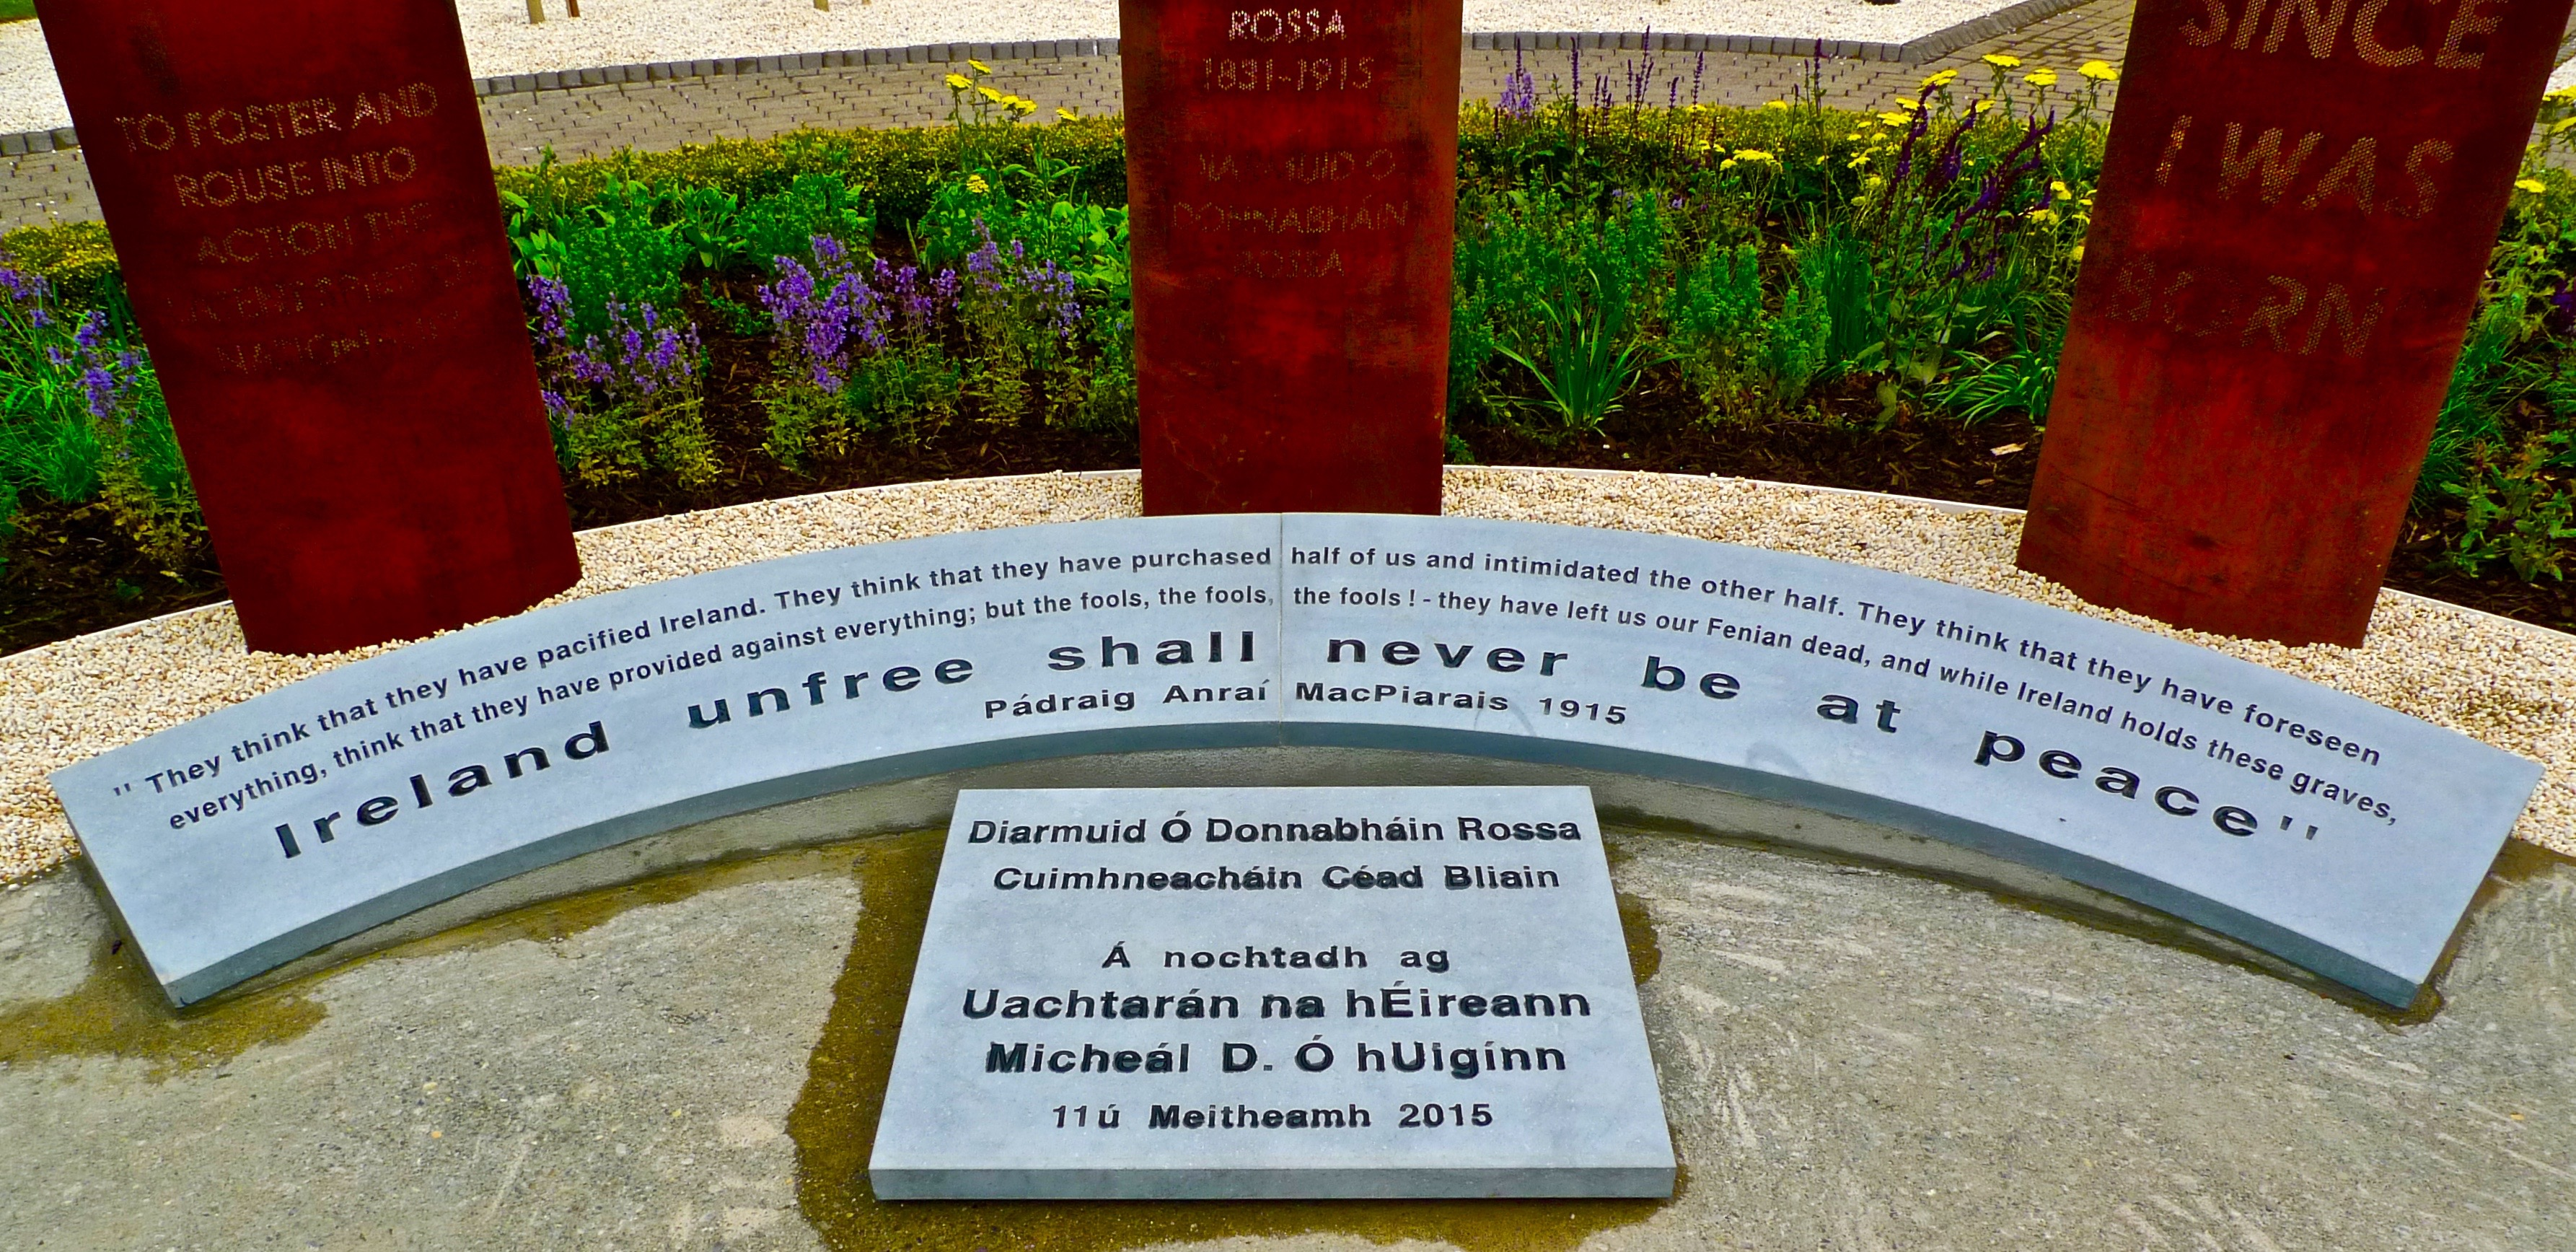 New commemorative sculpture in Skibbereen's O'Donovan Rossa Memorial Park